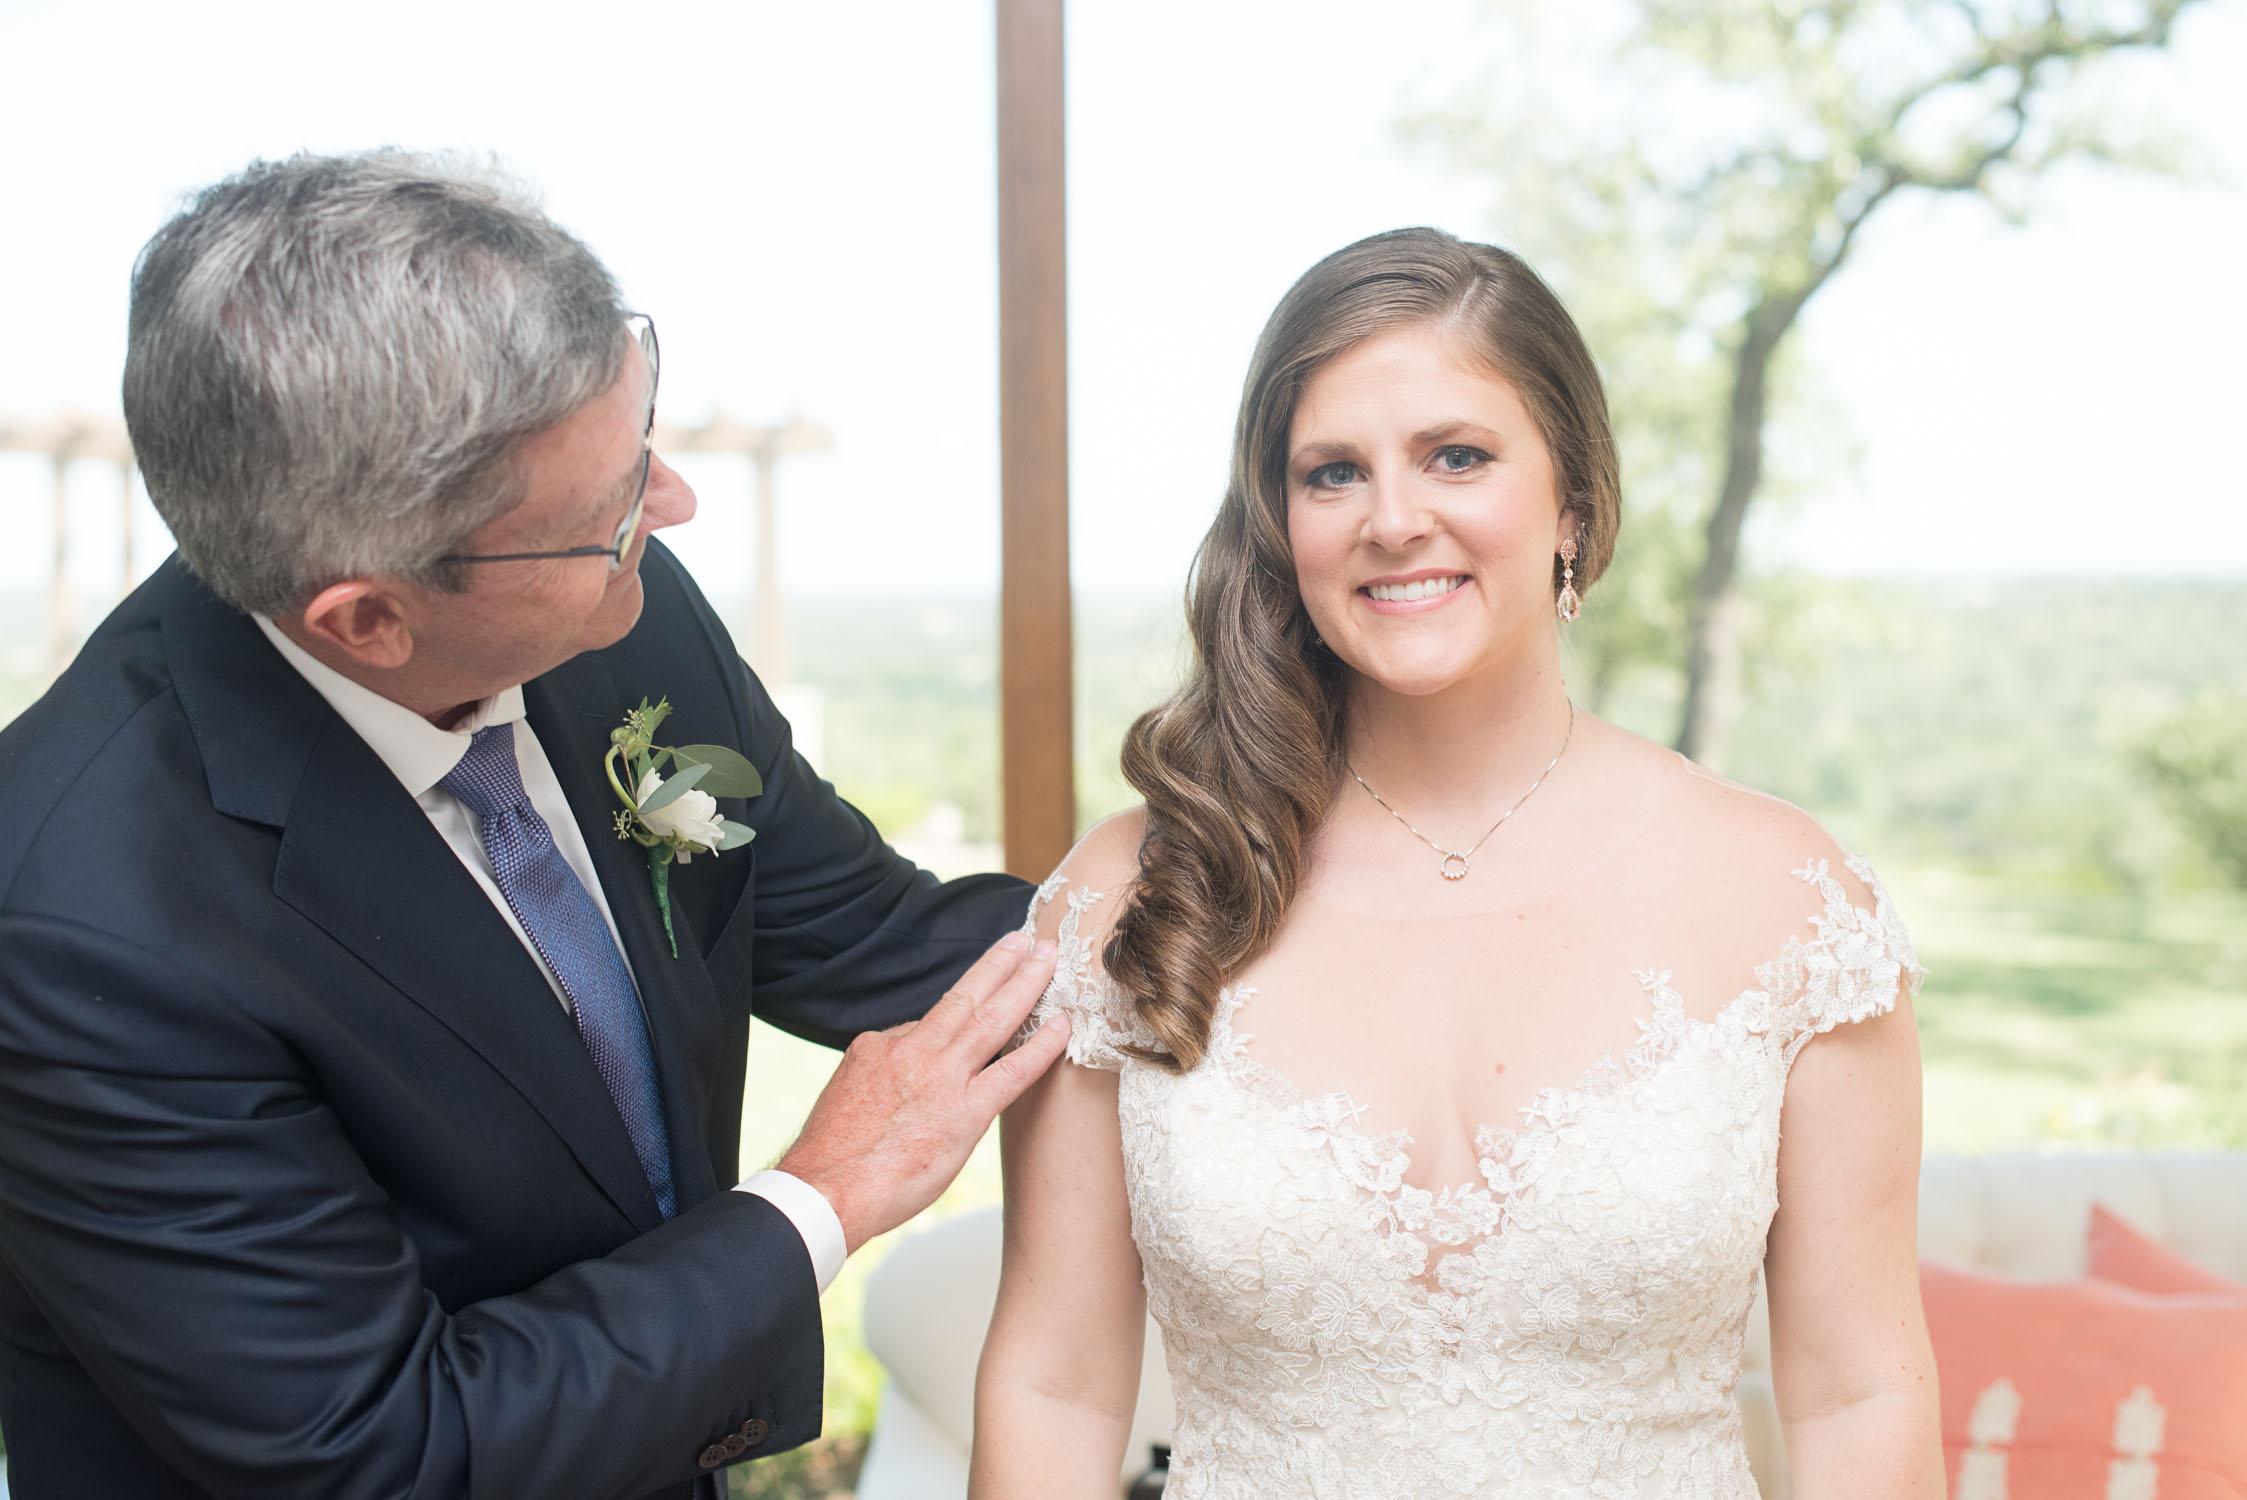 Hinton Wedding at Canyonwood Ridge Dripping Springs Texas Wedding Photography-76.jpg